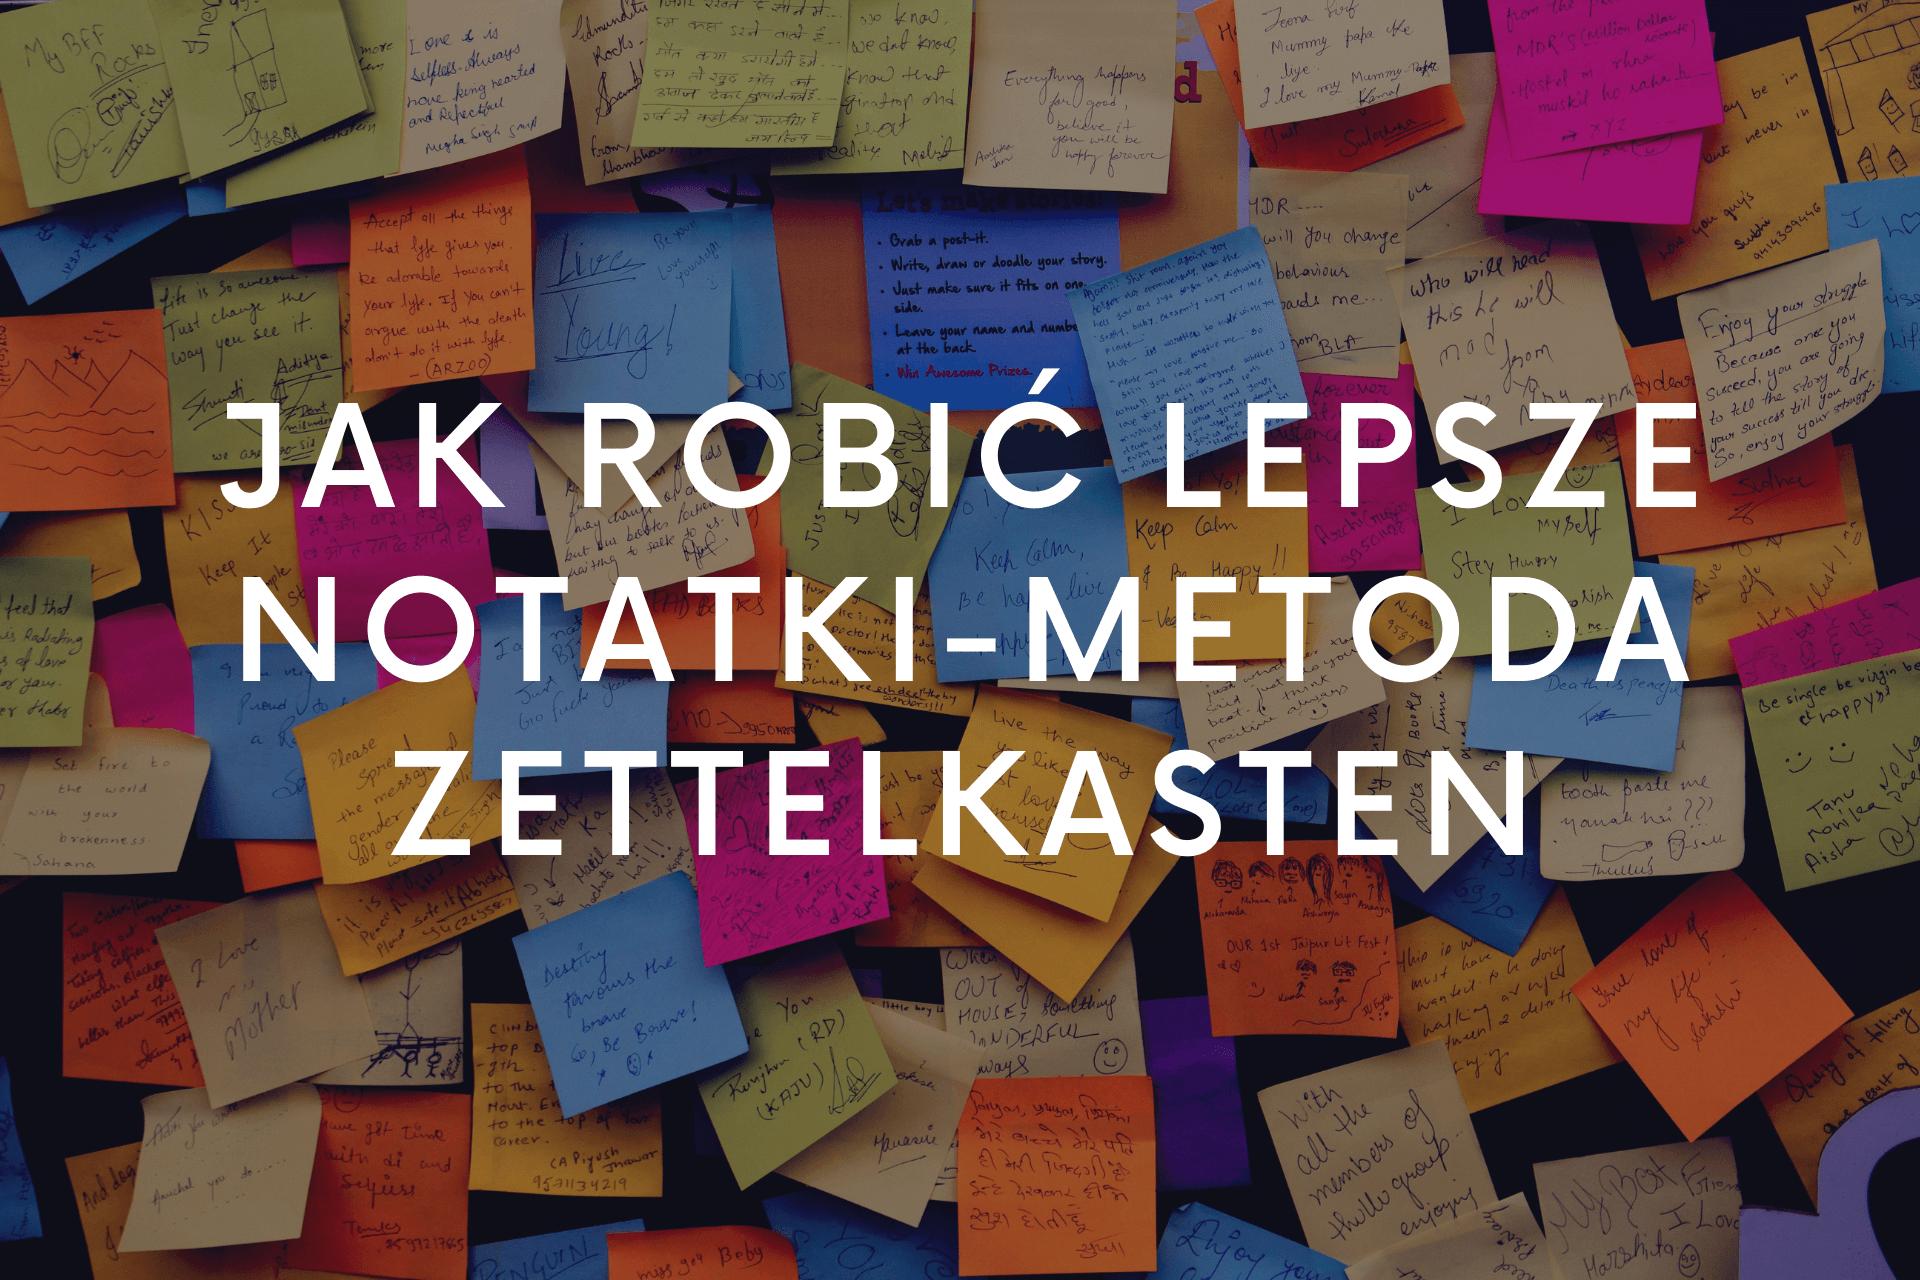 Jak robić lepsze notatki - metoda Zettelkasten